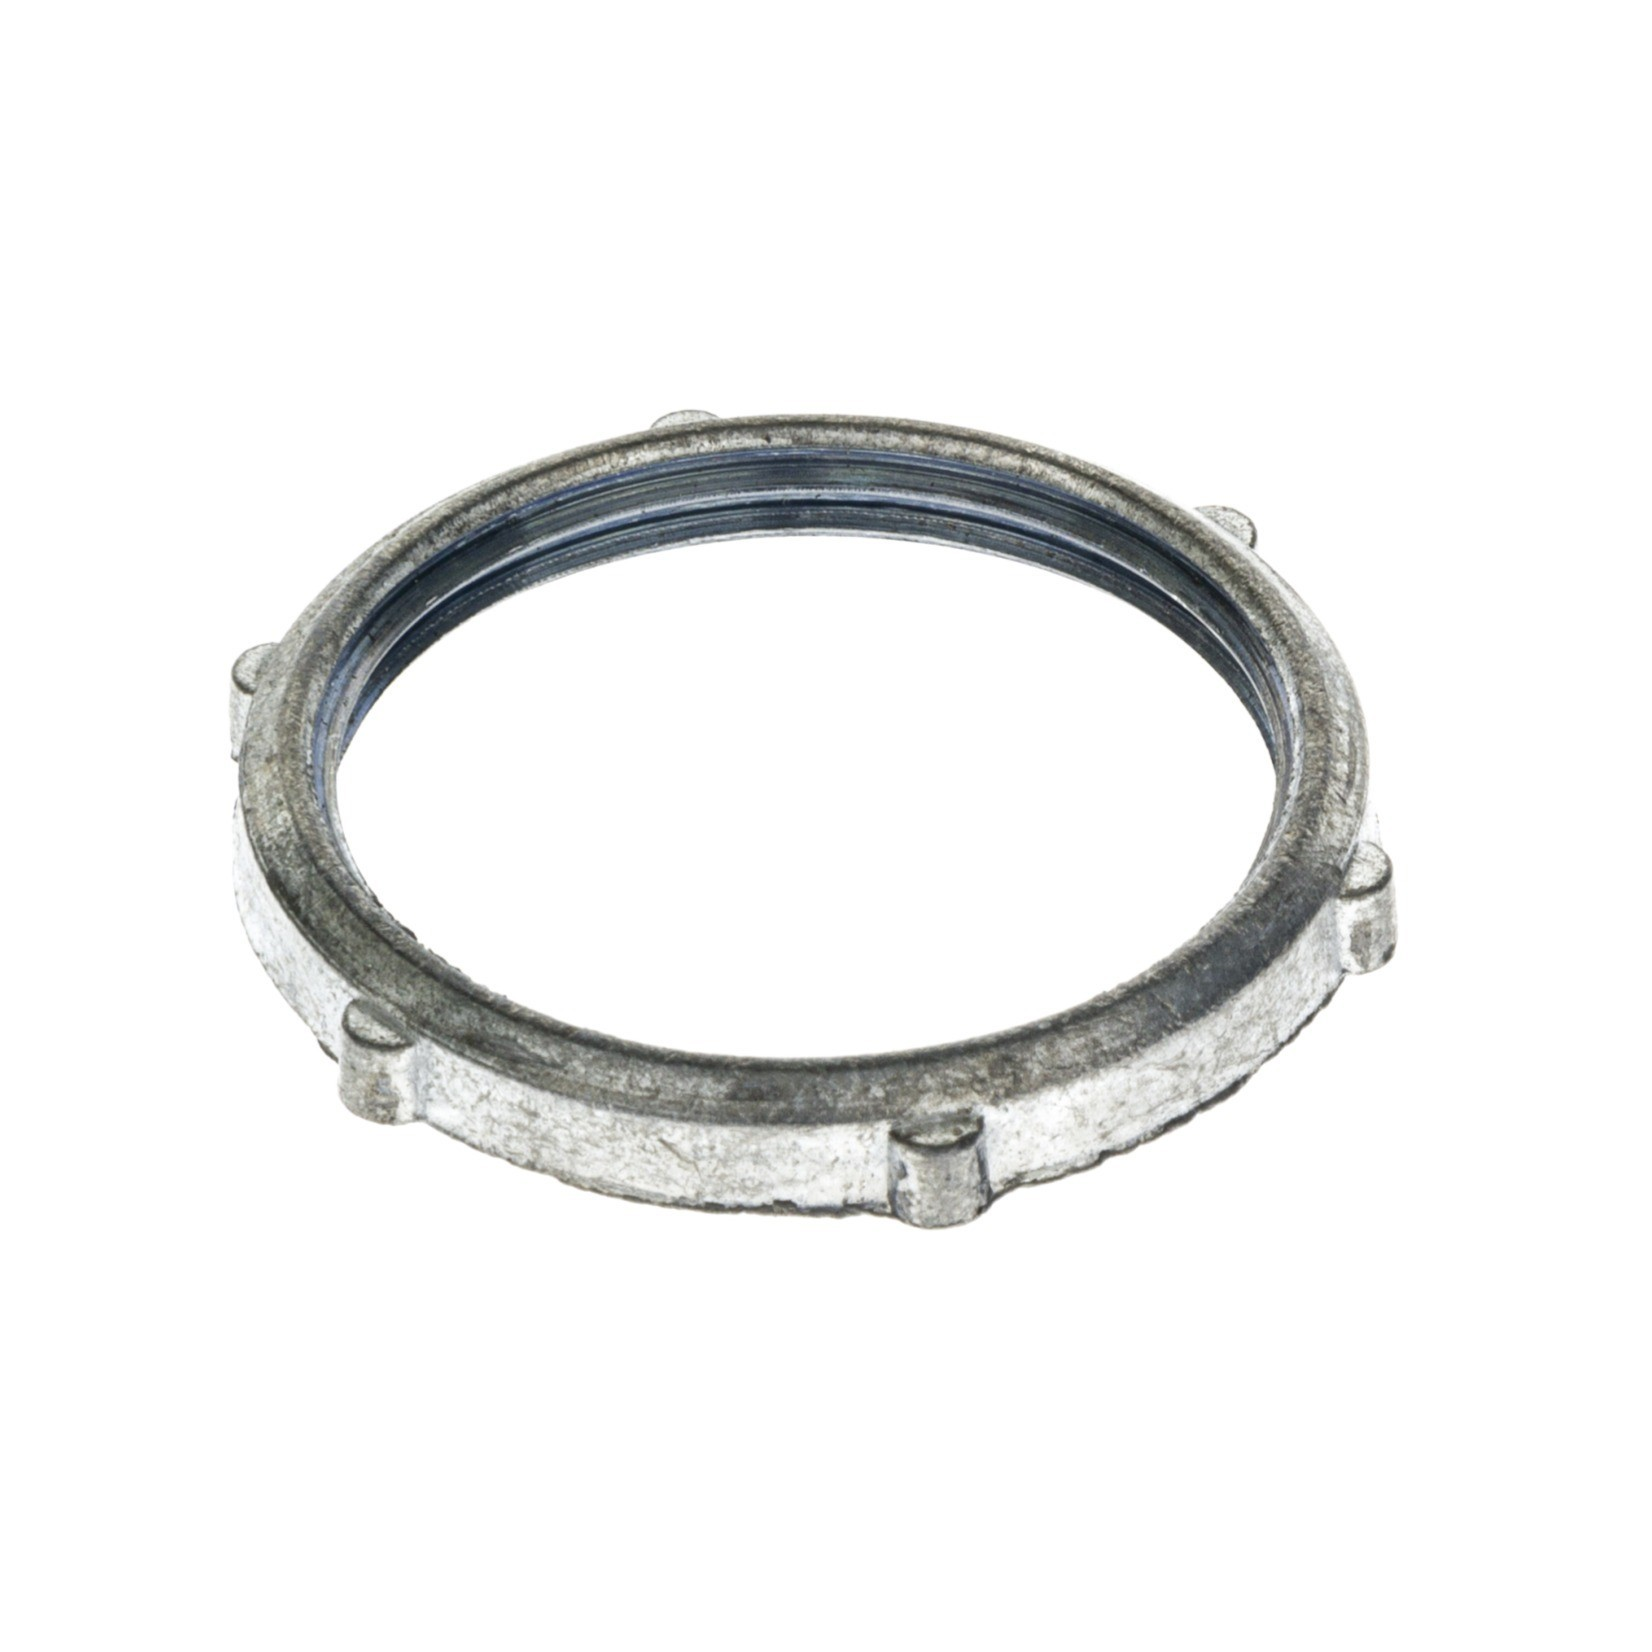 Arruela Roscavel 3 Aluminio Cinza - Mavel